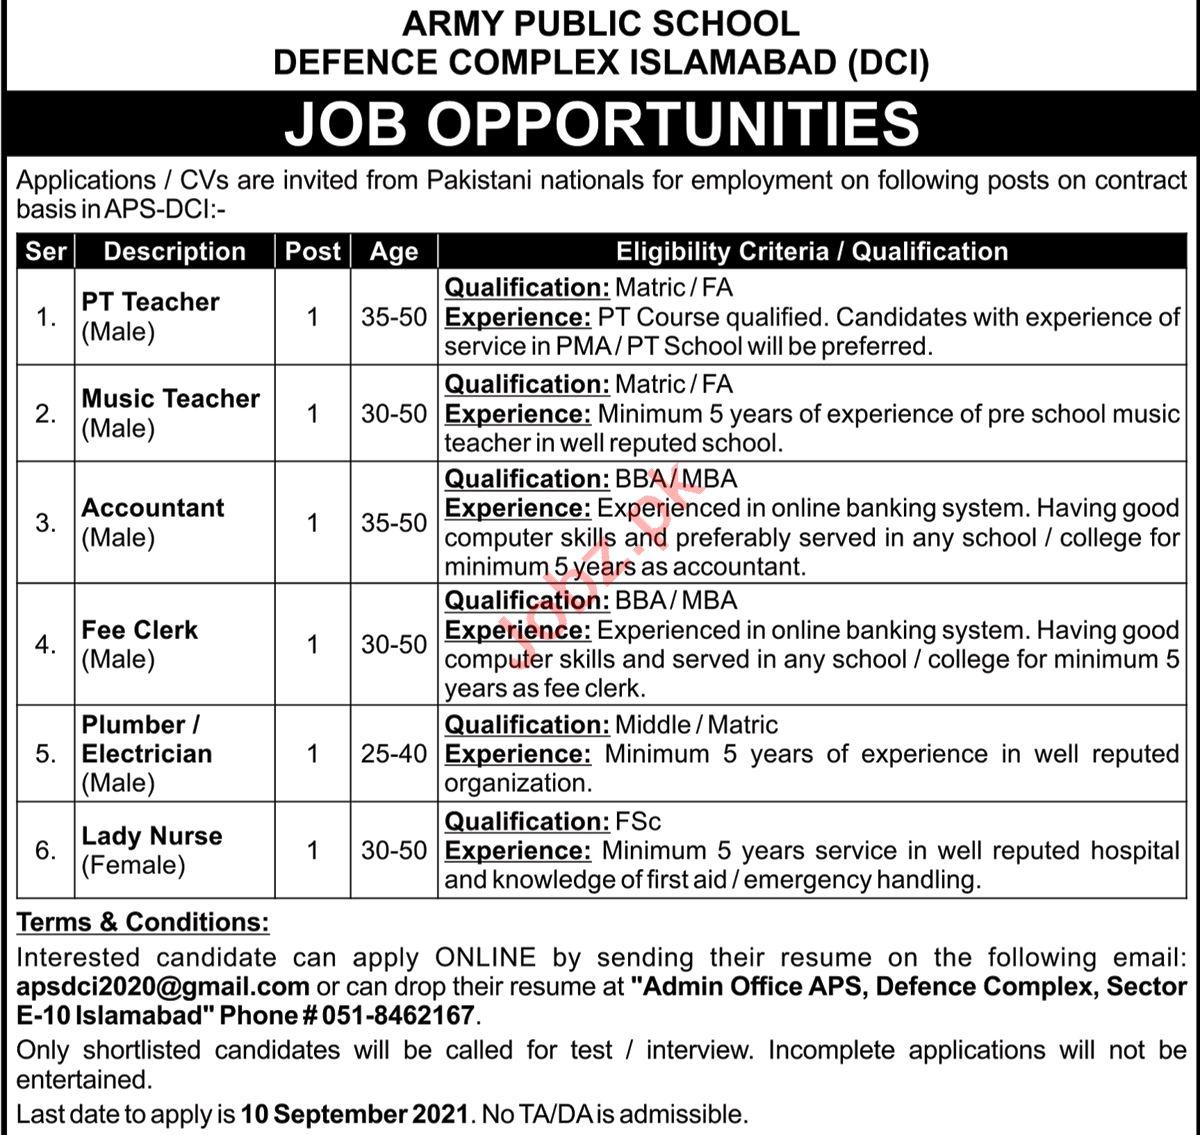 Army Public School APS DCI Defence Complex Islamabad Jobs